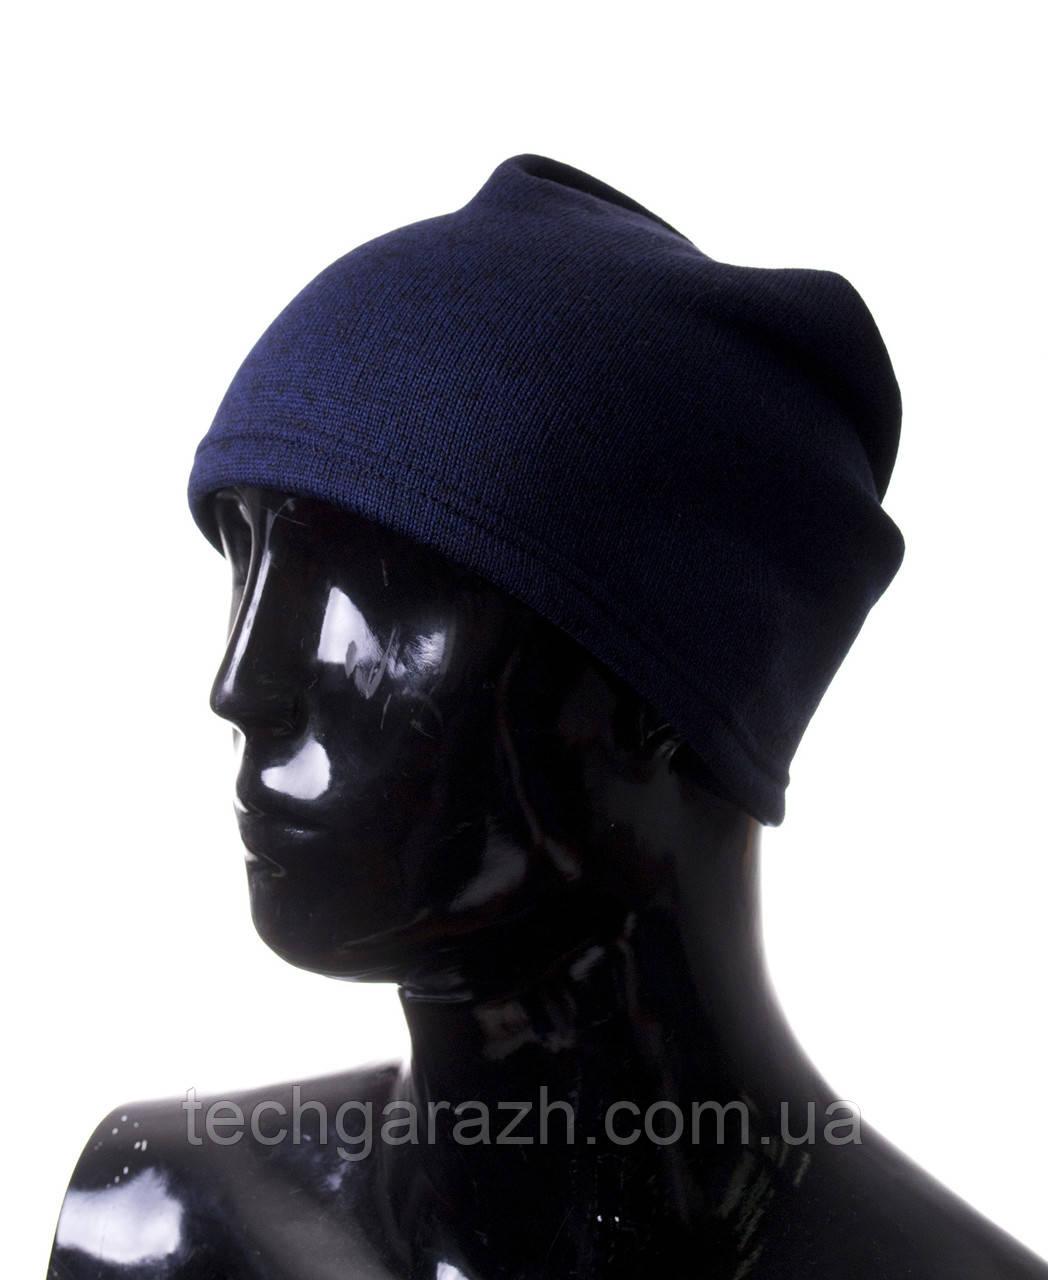 Шапка Echt Gloves One size Синий (E1ton d-blue)